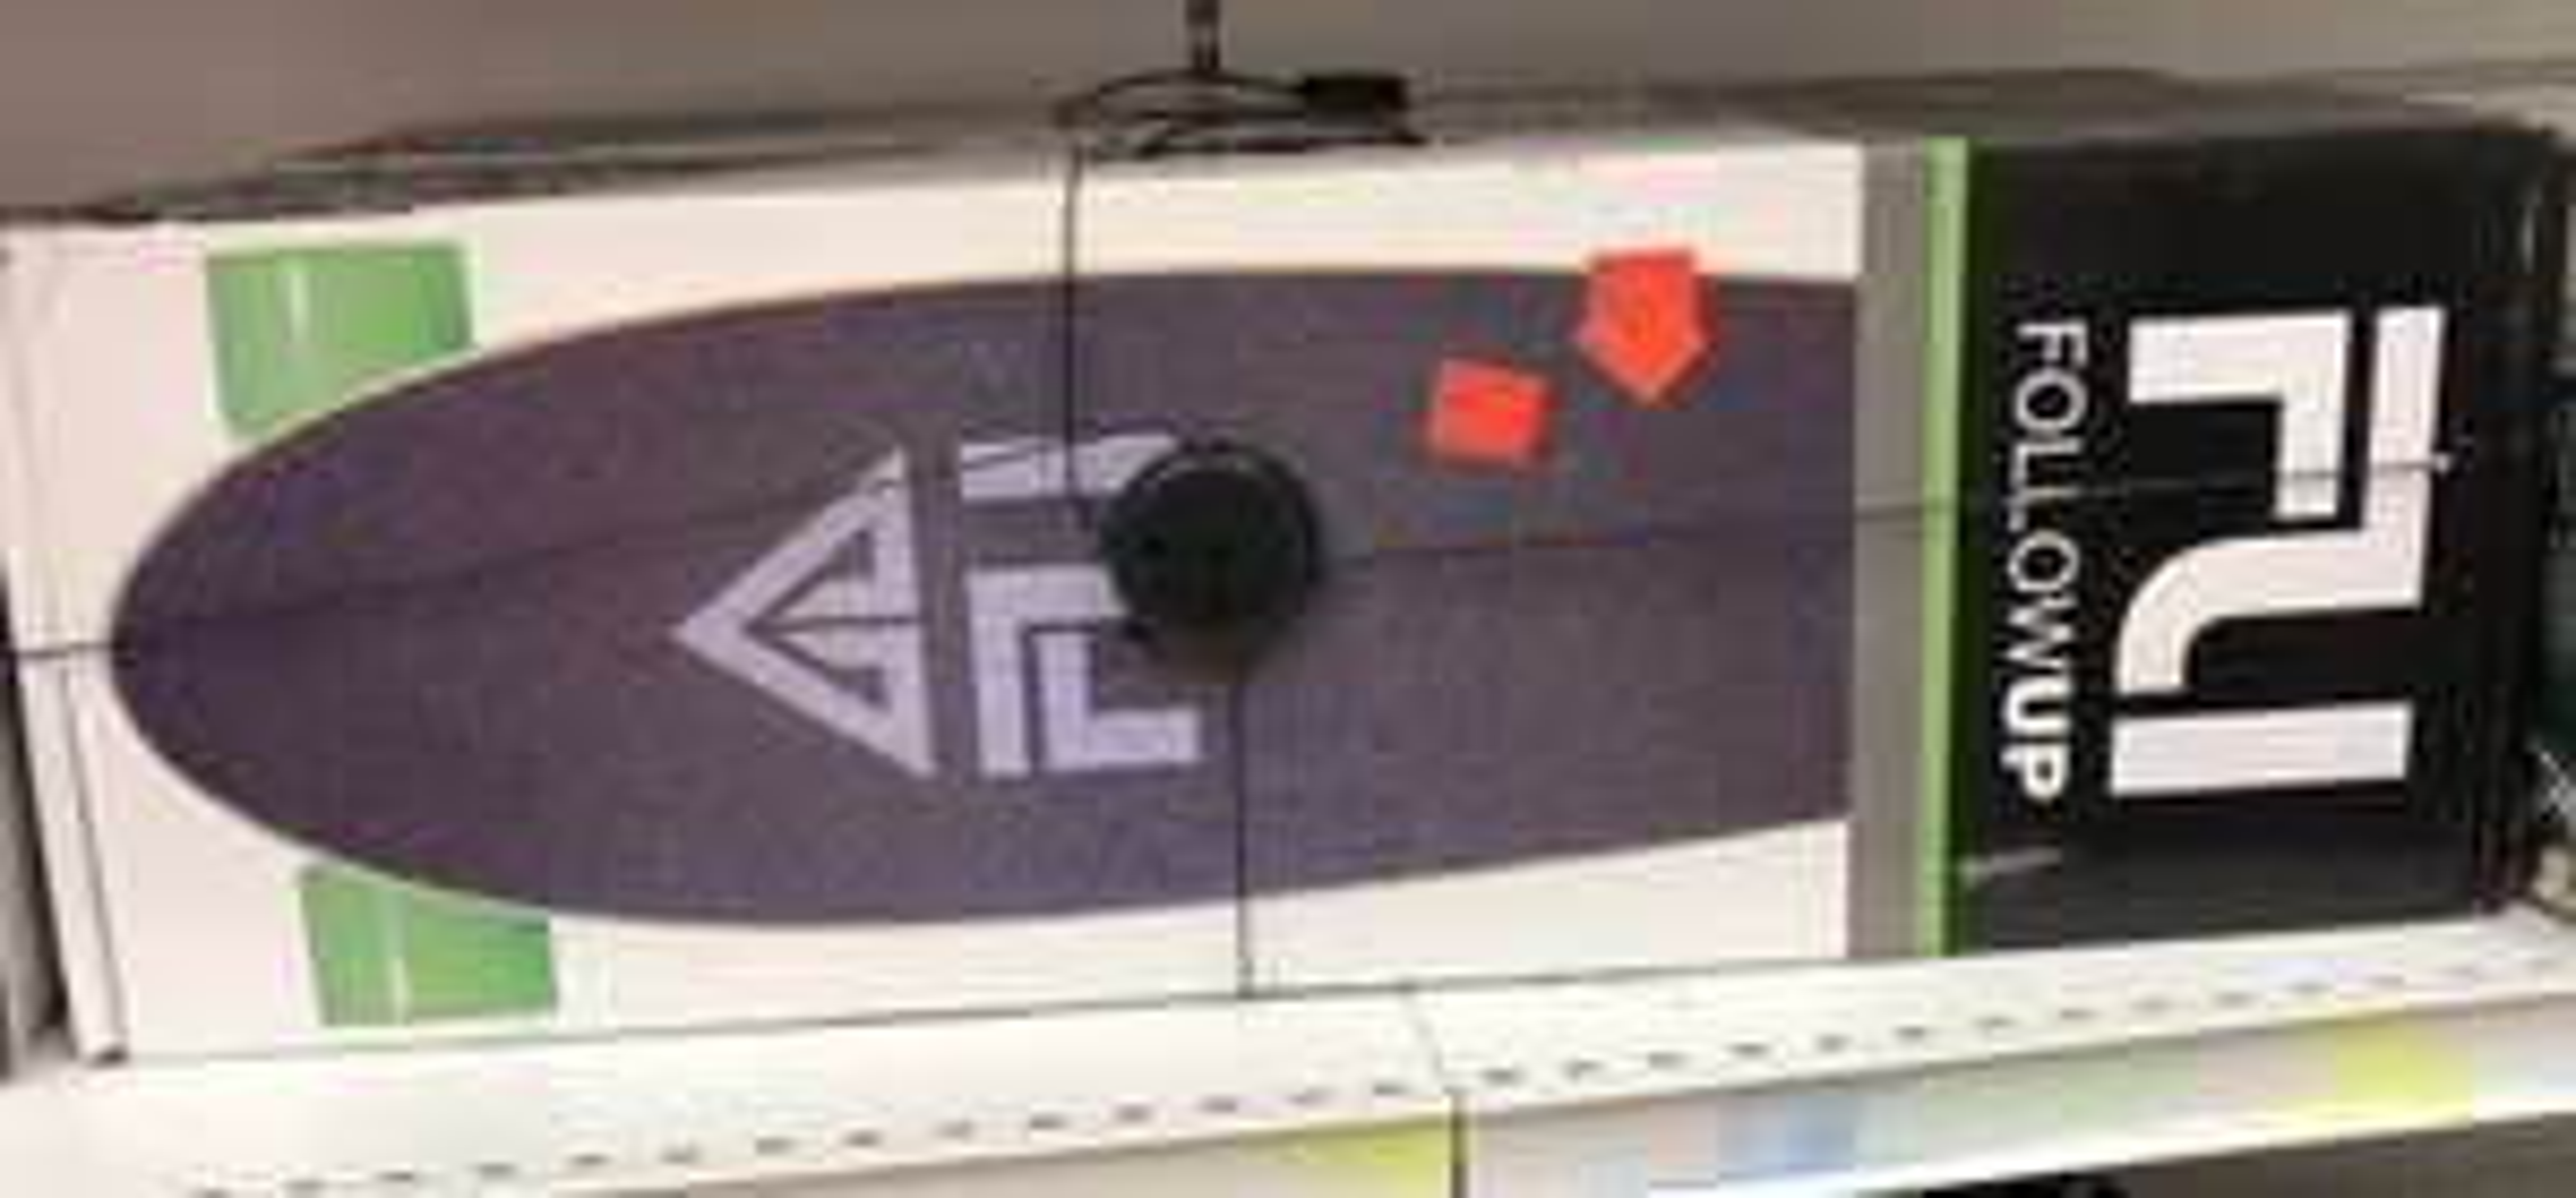 Skateboard Eléctrique Cruiser Follow Up Urban - Grand-Littoral (13)